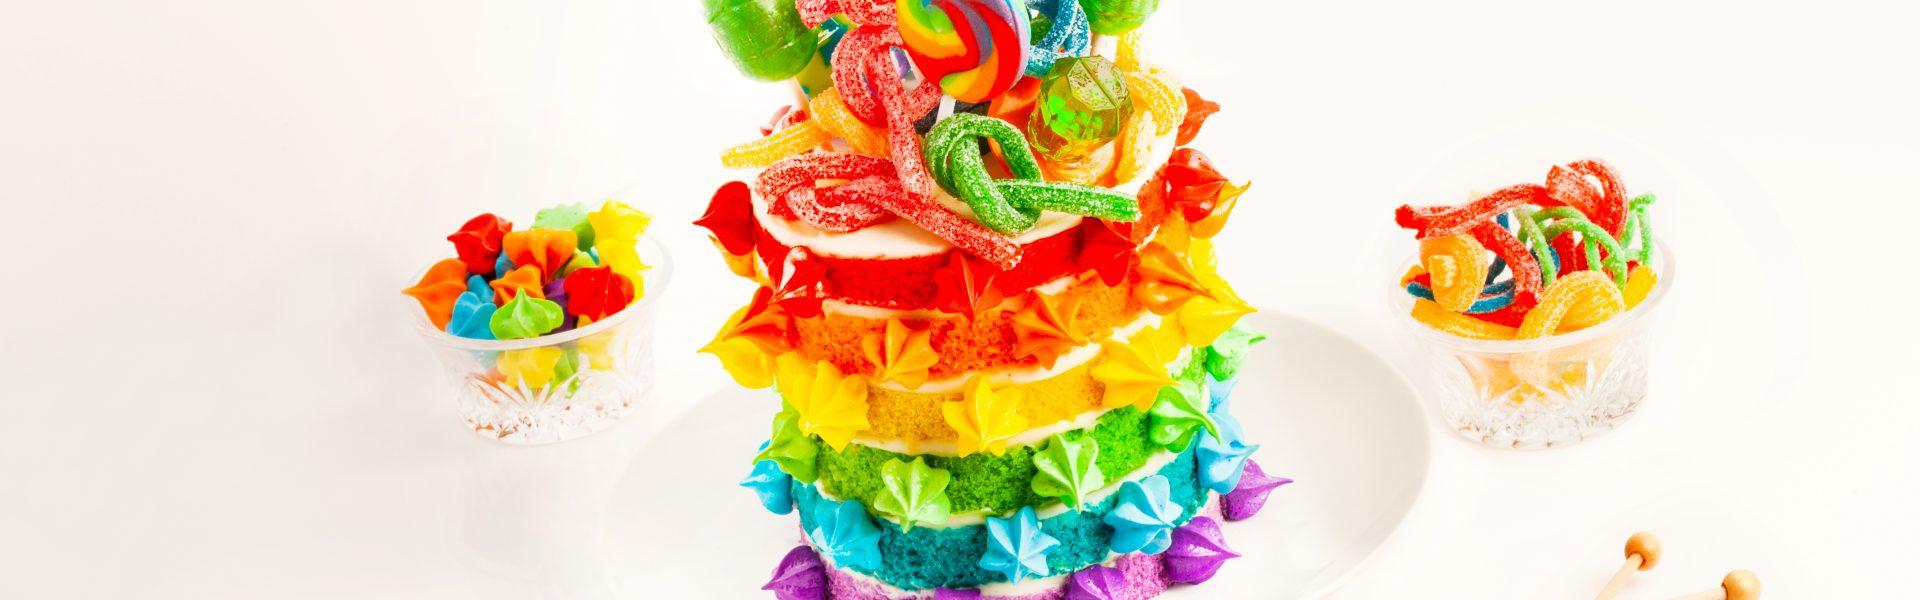 BOX PRIDE RAINBOW CAKE